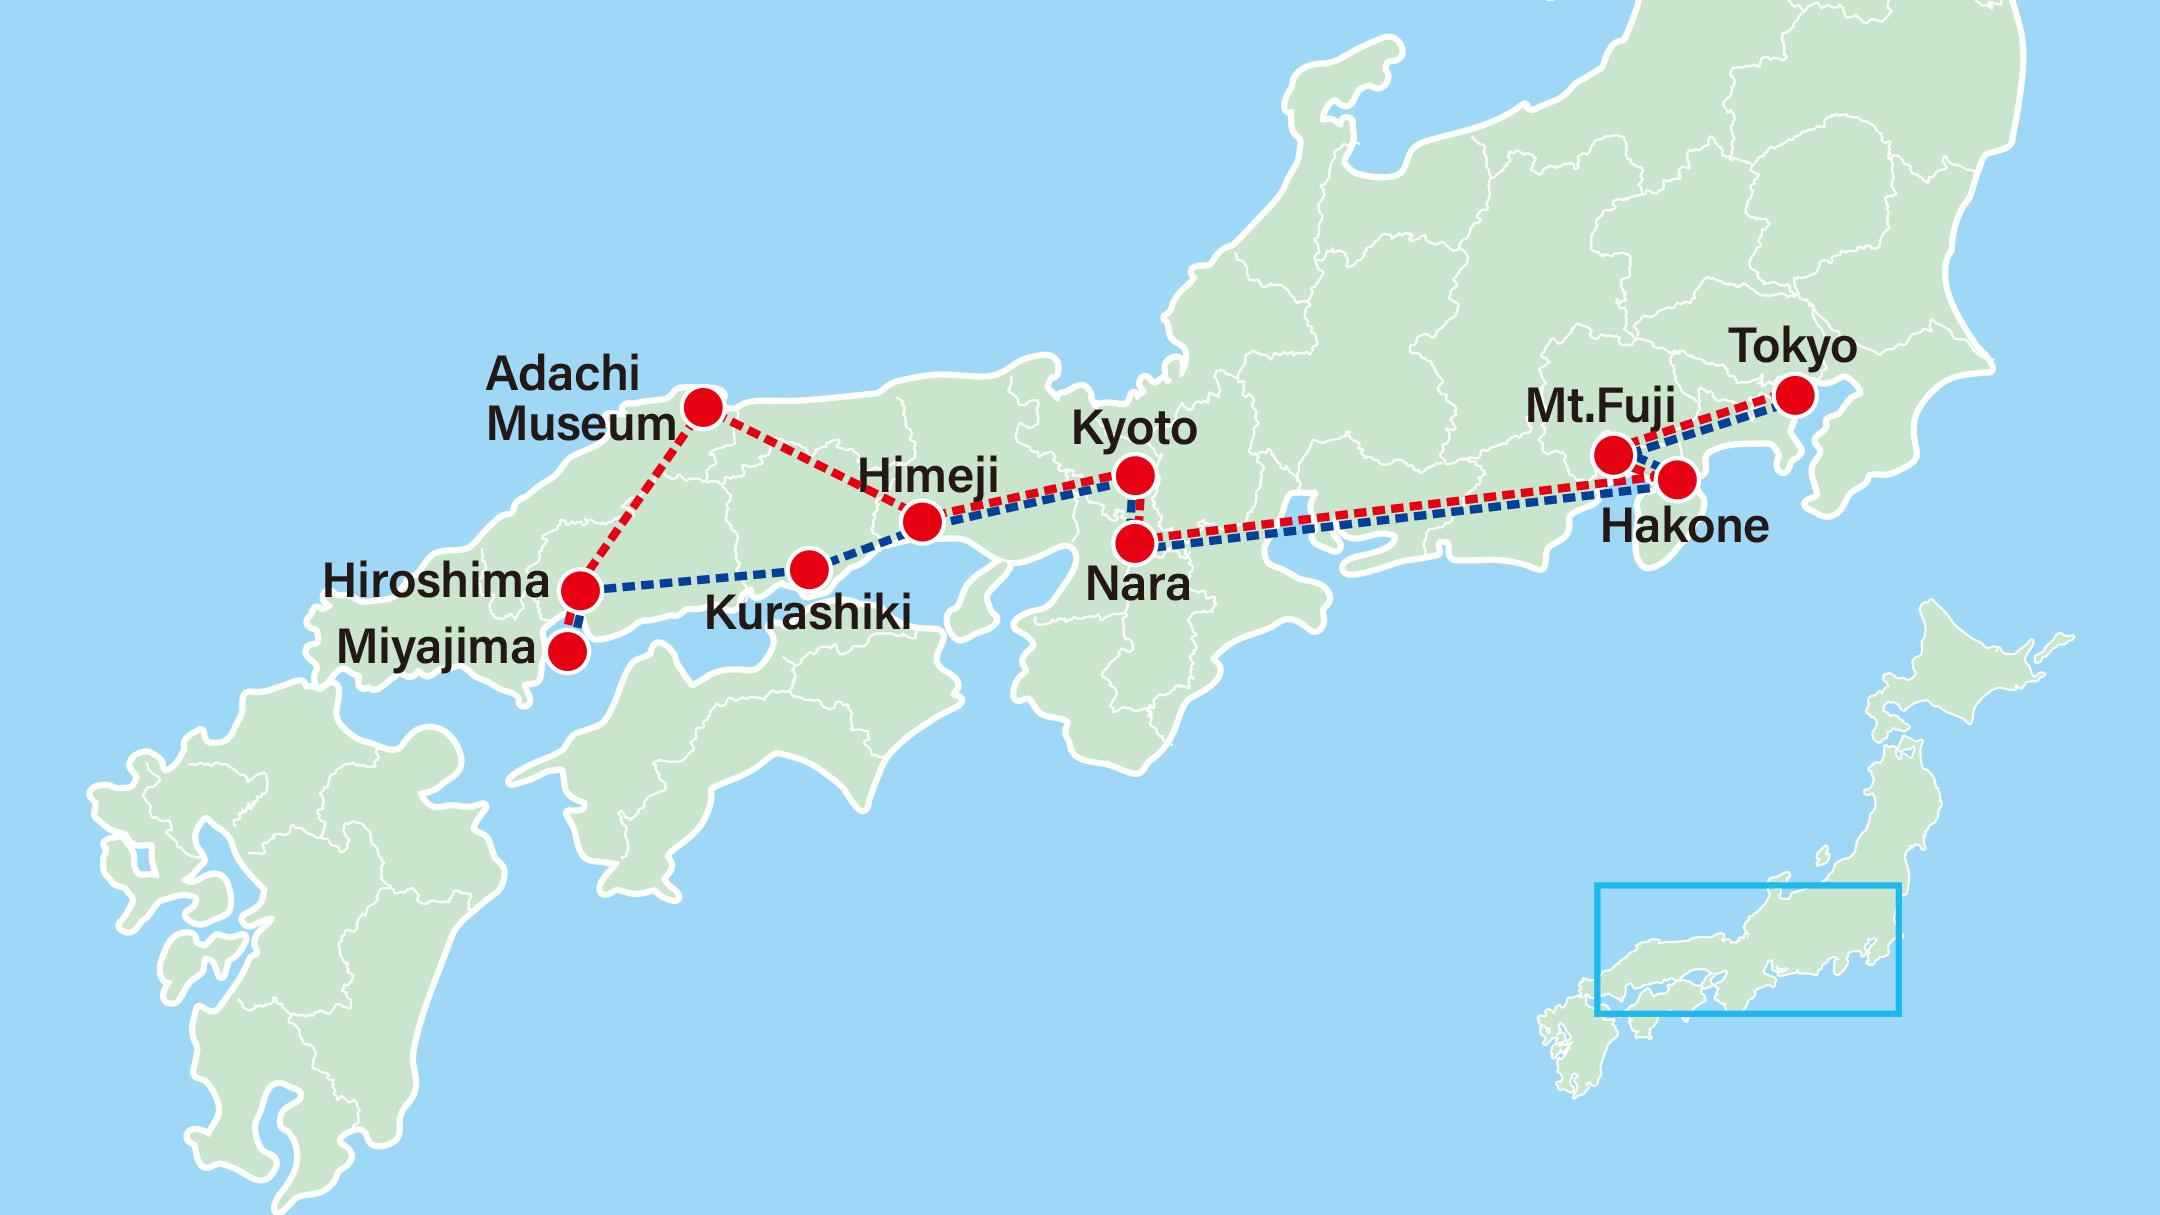 Highlights of Japan with Anime 11 Days-Tokyo-Hakone-Kyoto-Nara-Himeji-Adachi-Hiroshima-Miyajima